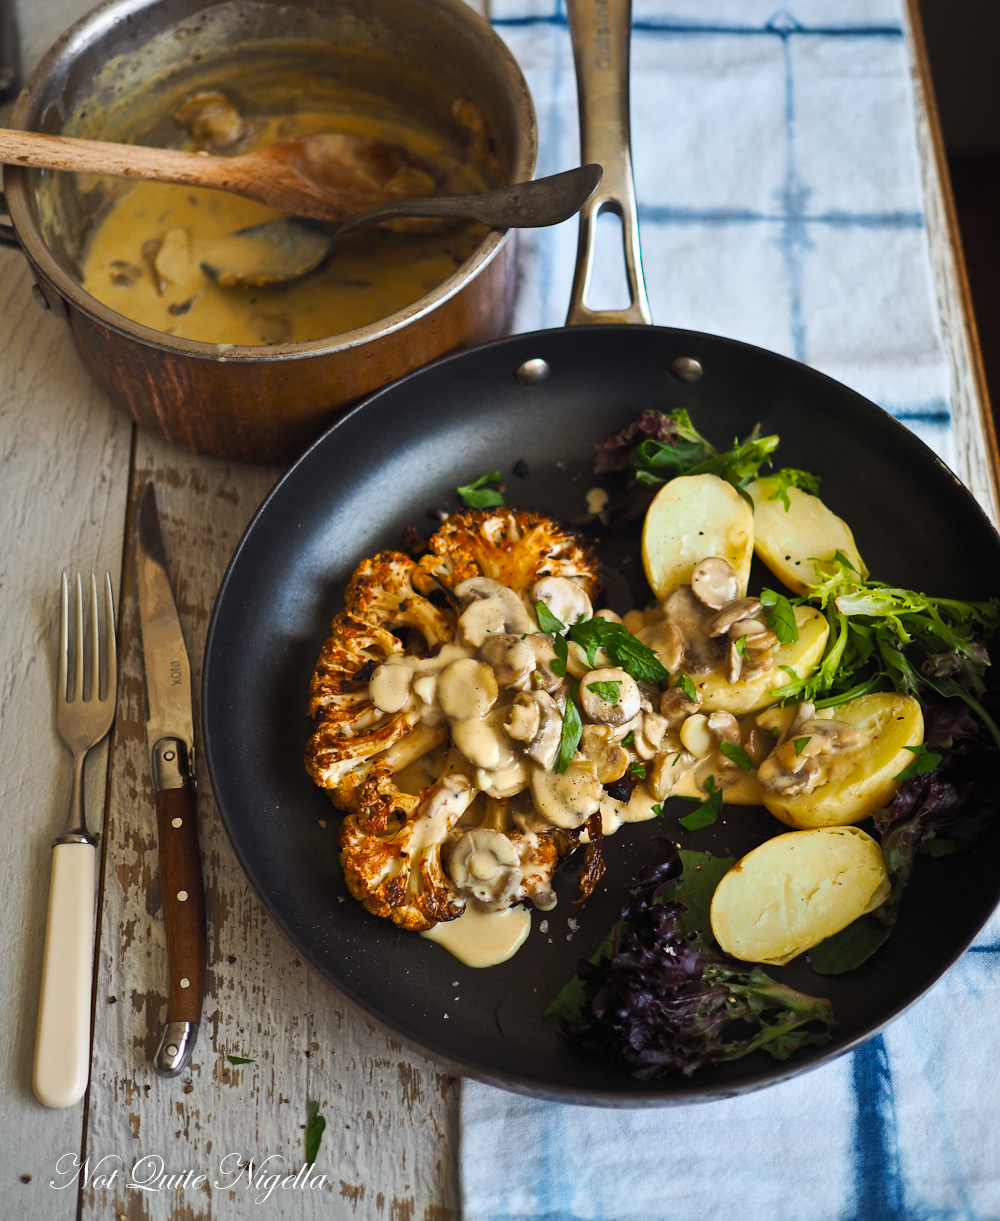 Easy Cauliflower Steak recipe